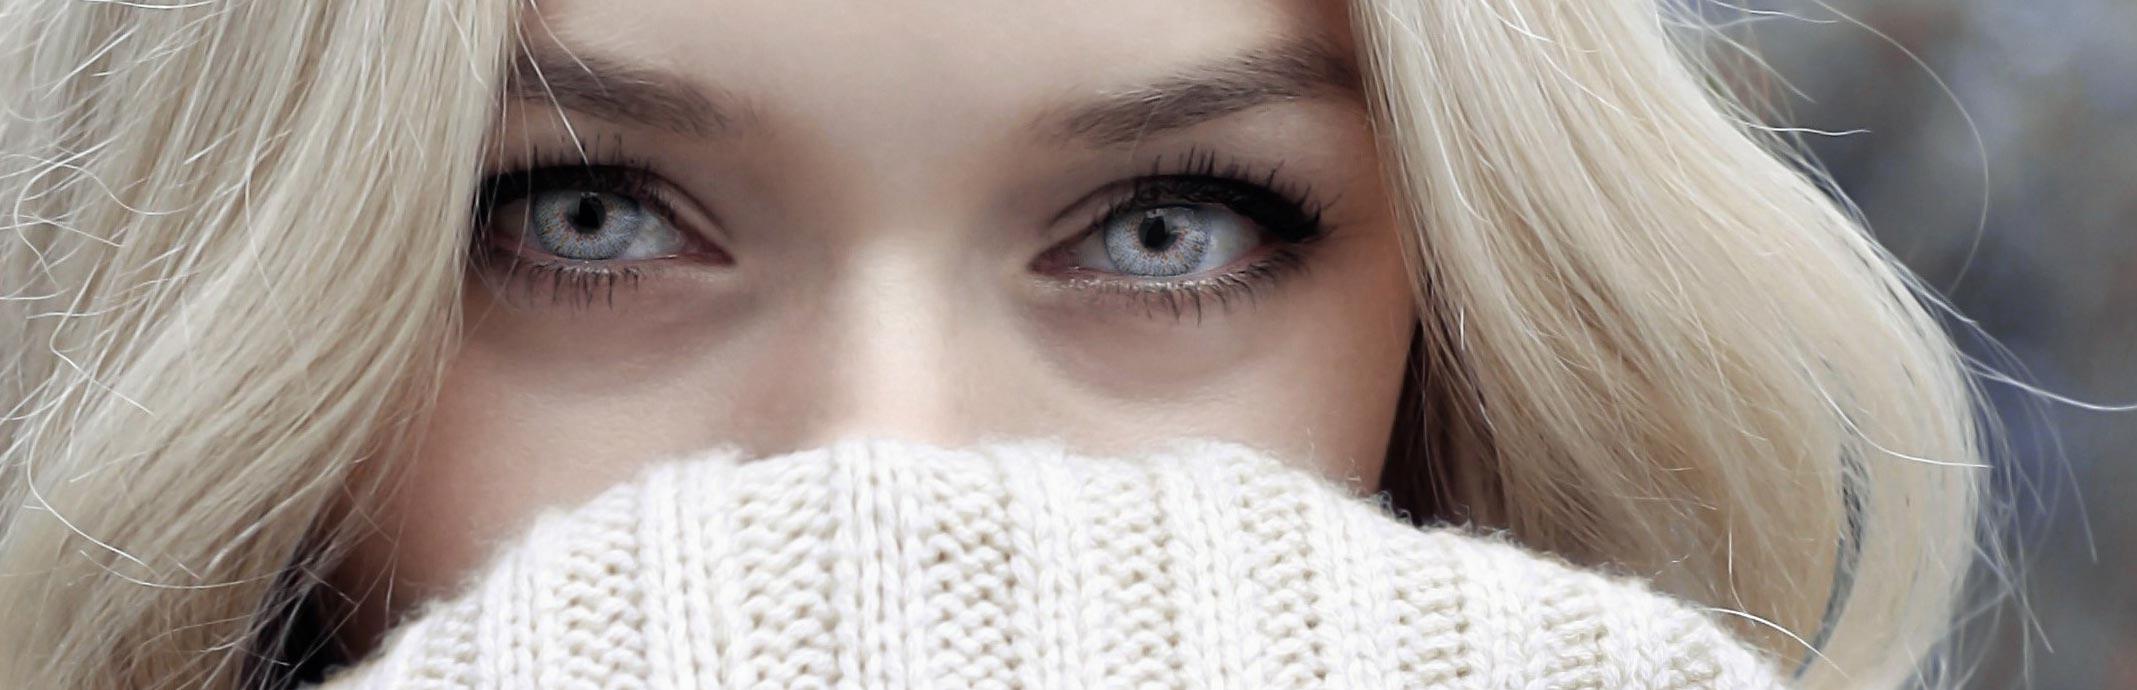 blonde-sweater-slim-4.jpeg